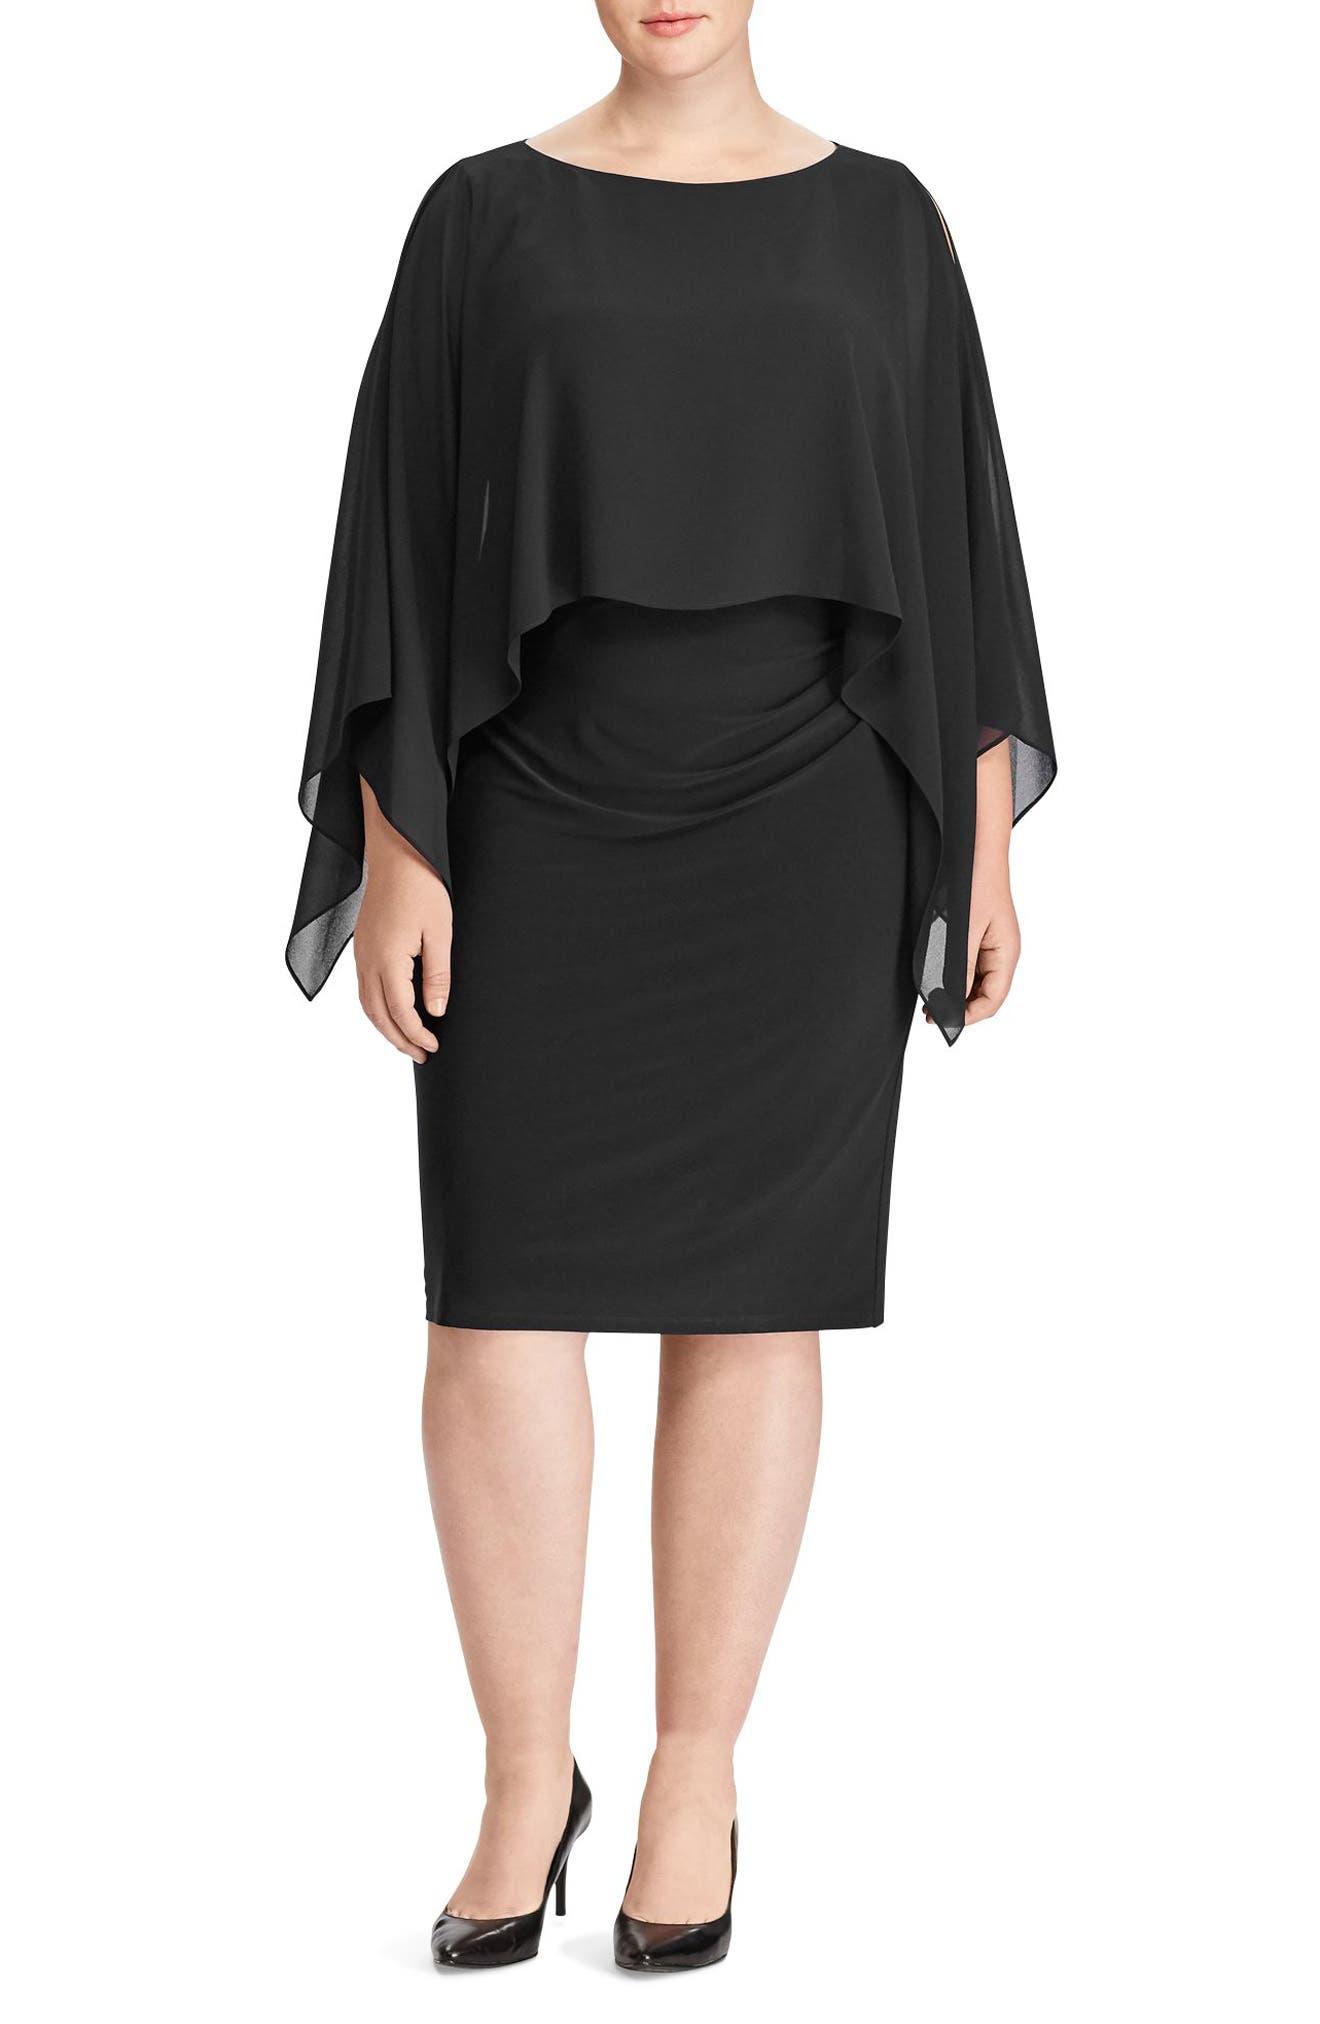 Mercinitta Dress,                             Main thumbnail 1, color,                             Black